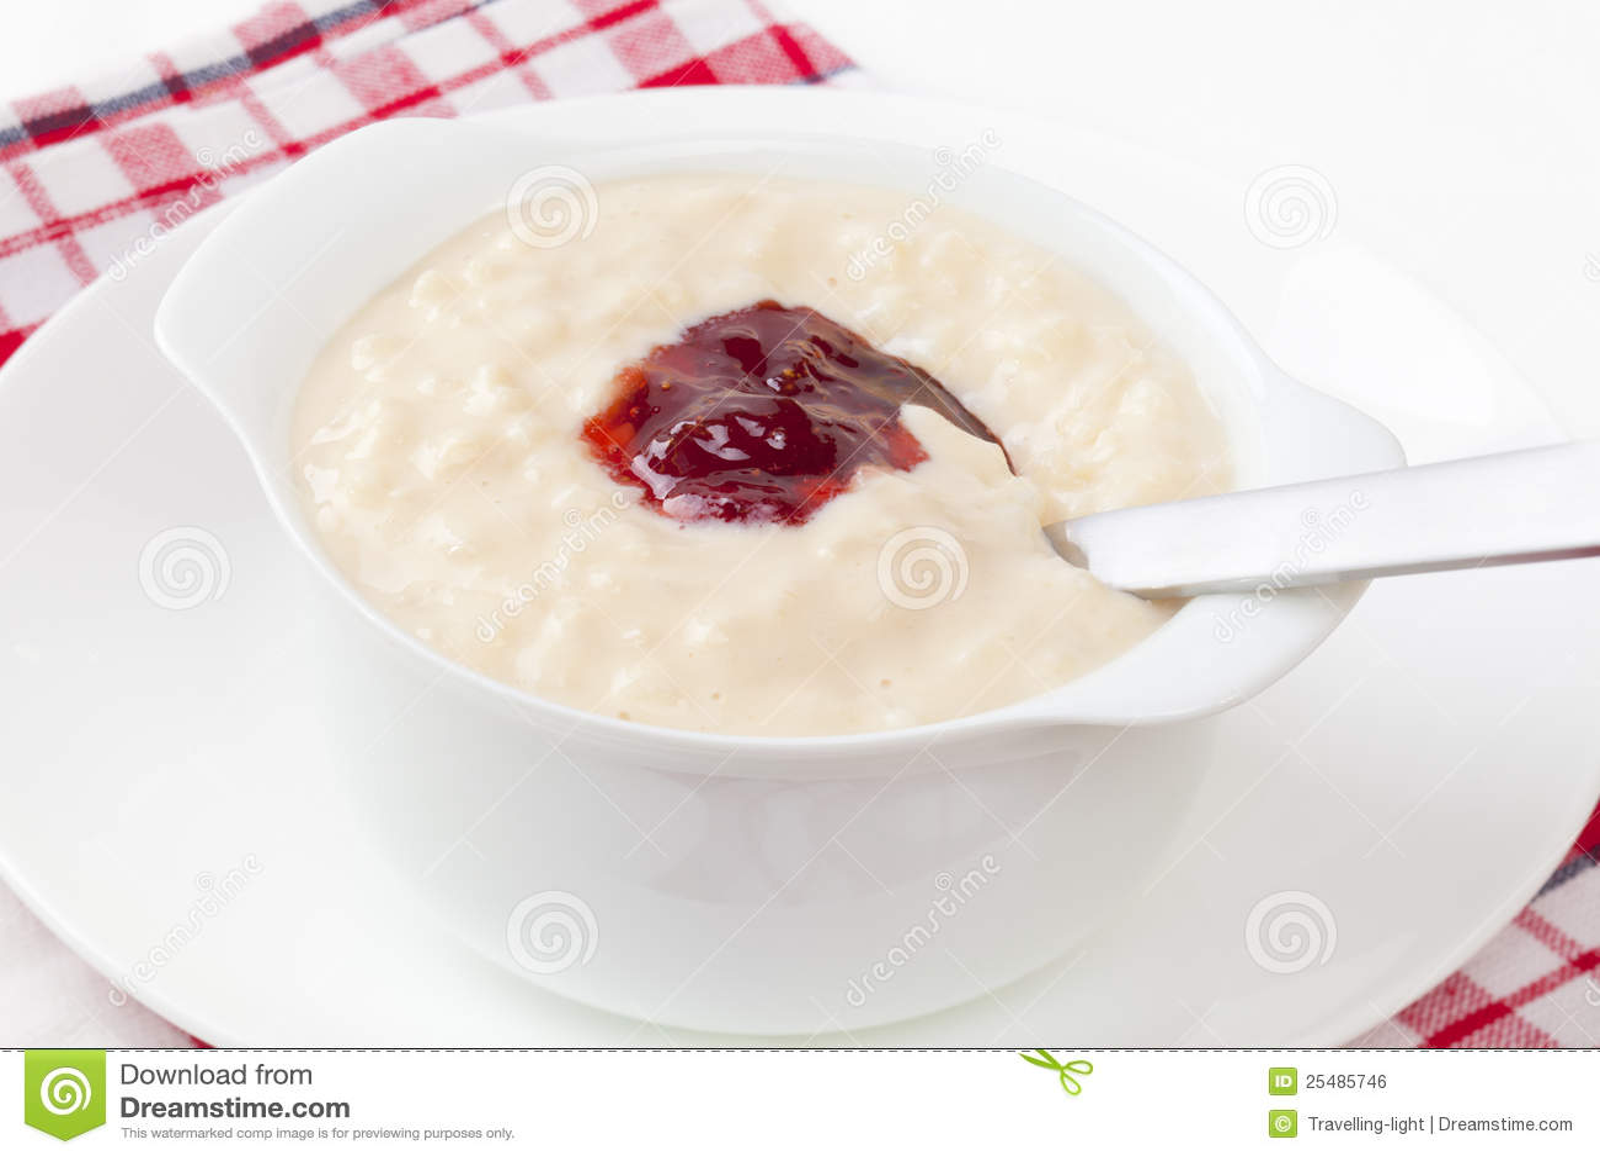 Rice Pudding With Strawberry Jam Stock Photo - Image of ...